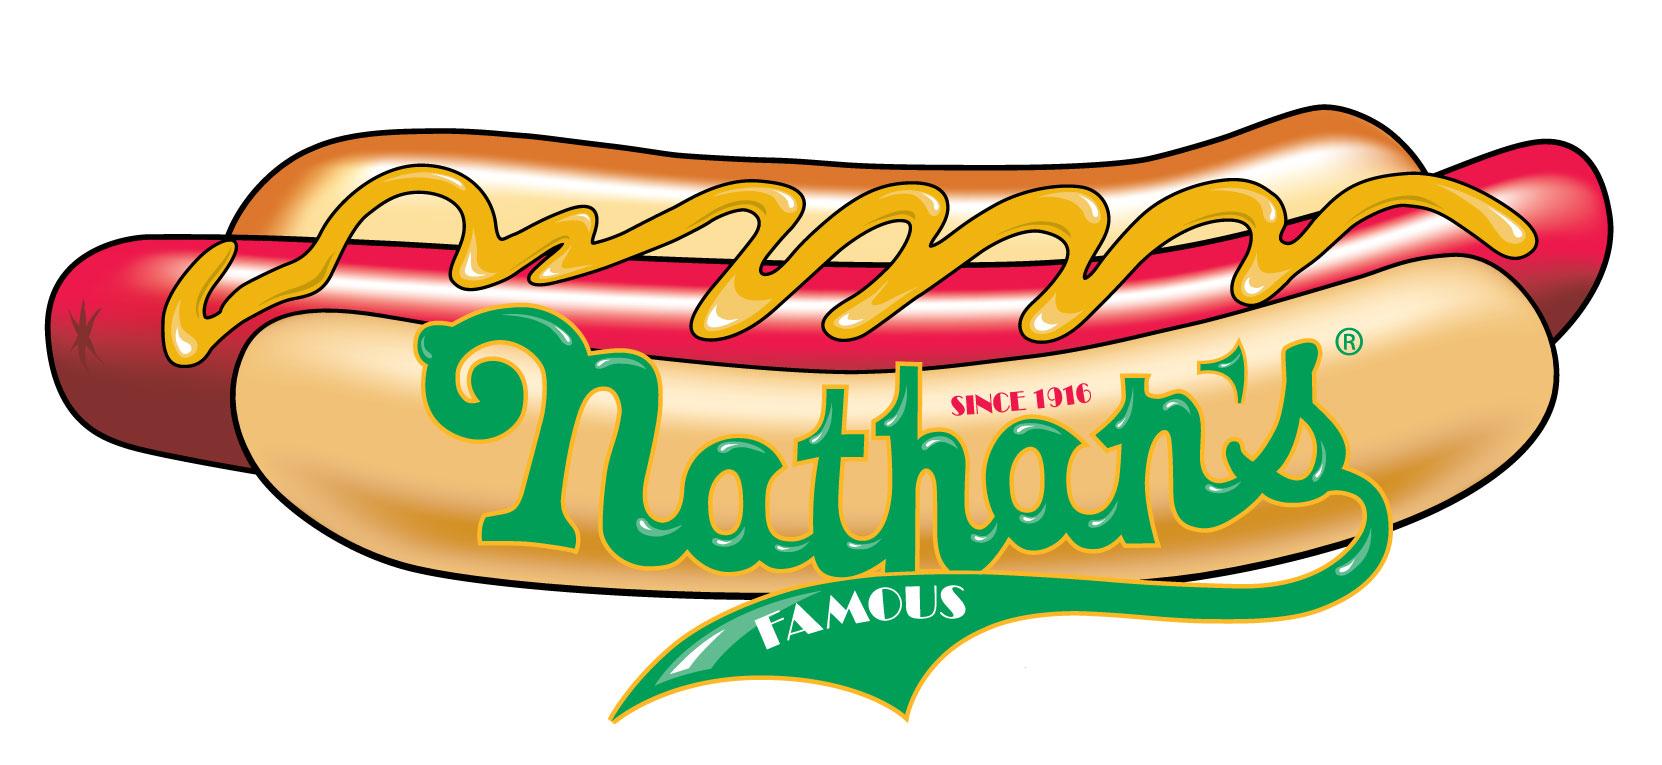 nathans-famous-hot-dog-logo.jpg